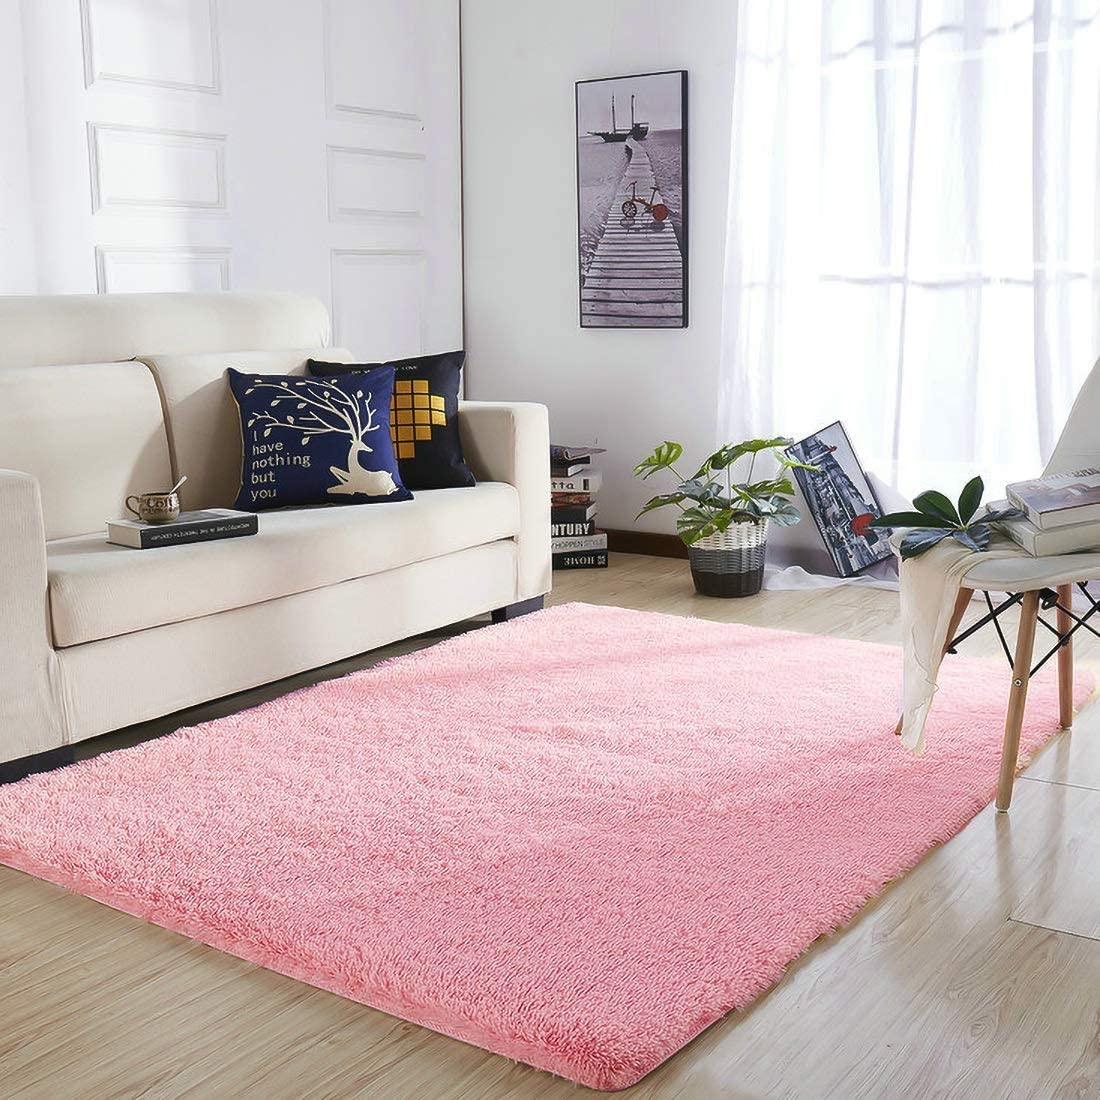 YOH Modern Soft Shaggy Fur Area Rug Fluffy Bedroom Rugs, Non-Slip Indoor Comfy Plush Accent Rug for Living Room Dorm Kids Boys Girls Room Luxury Furry Baby Nursery Decor Floor Carpet, 4x6 Feet Pink